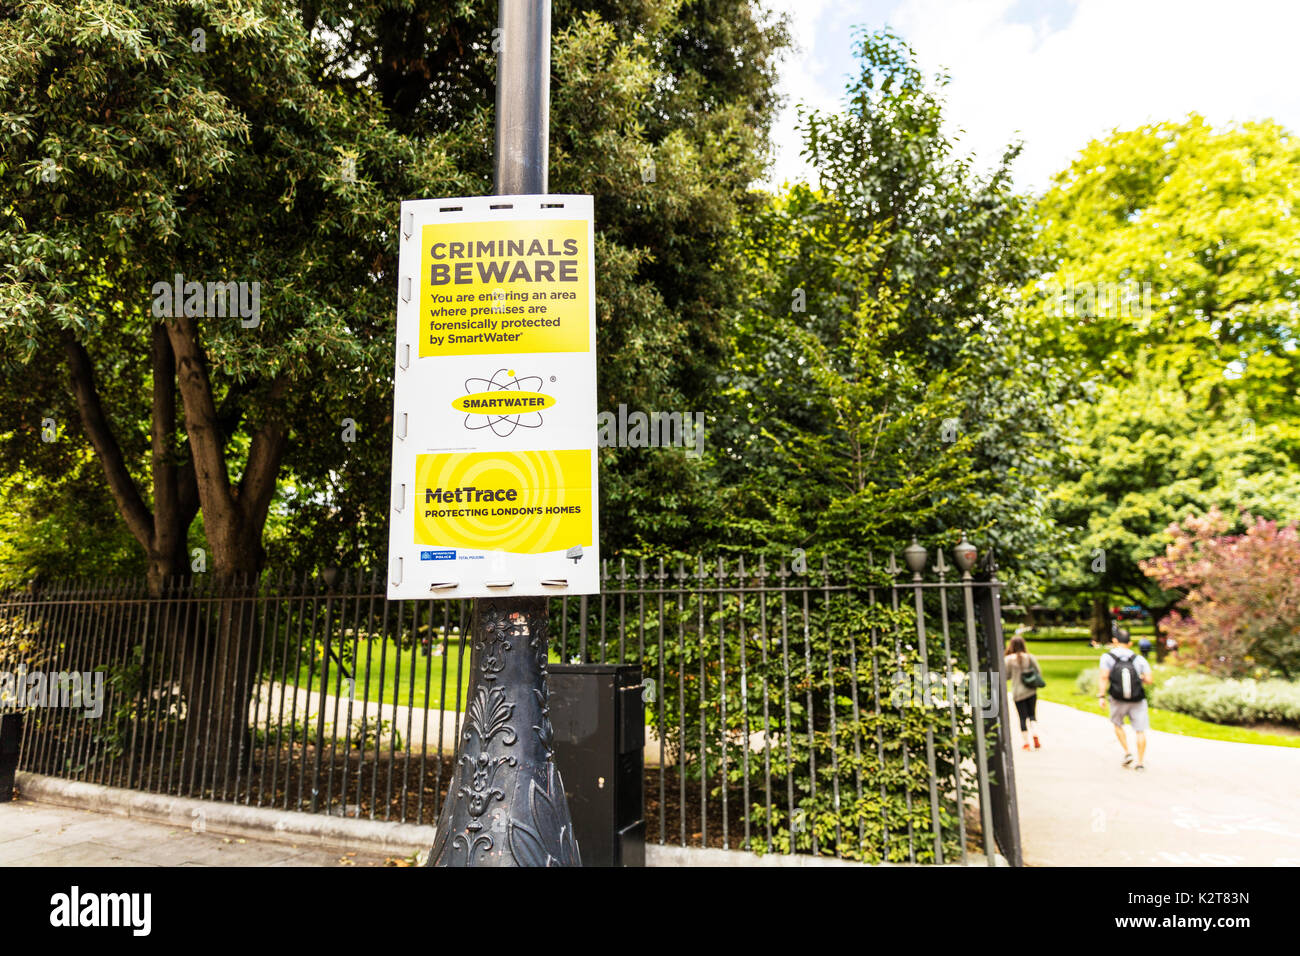 Smartwater sign, smart water sign, warning, MetTrace, met trace, Criminals beware sign, London UK, smartwater protection, - Stock Image